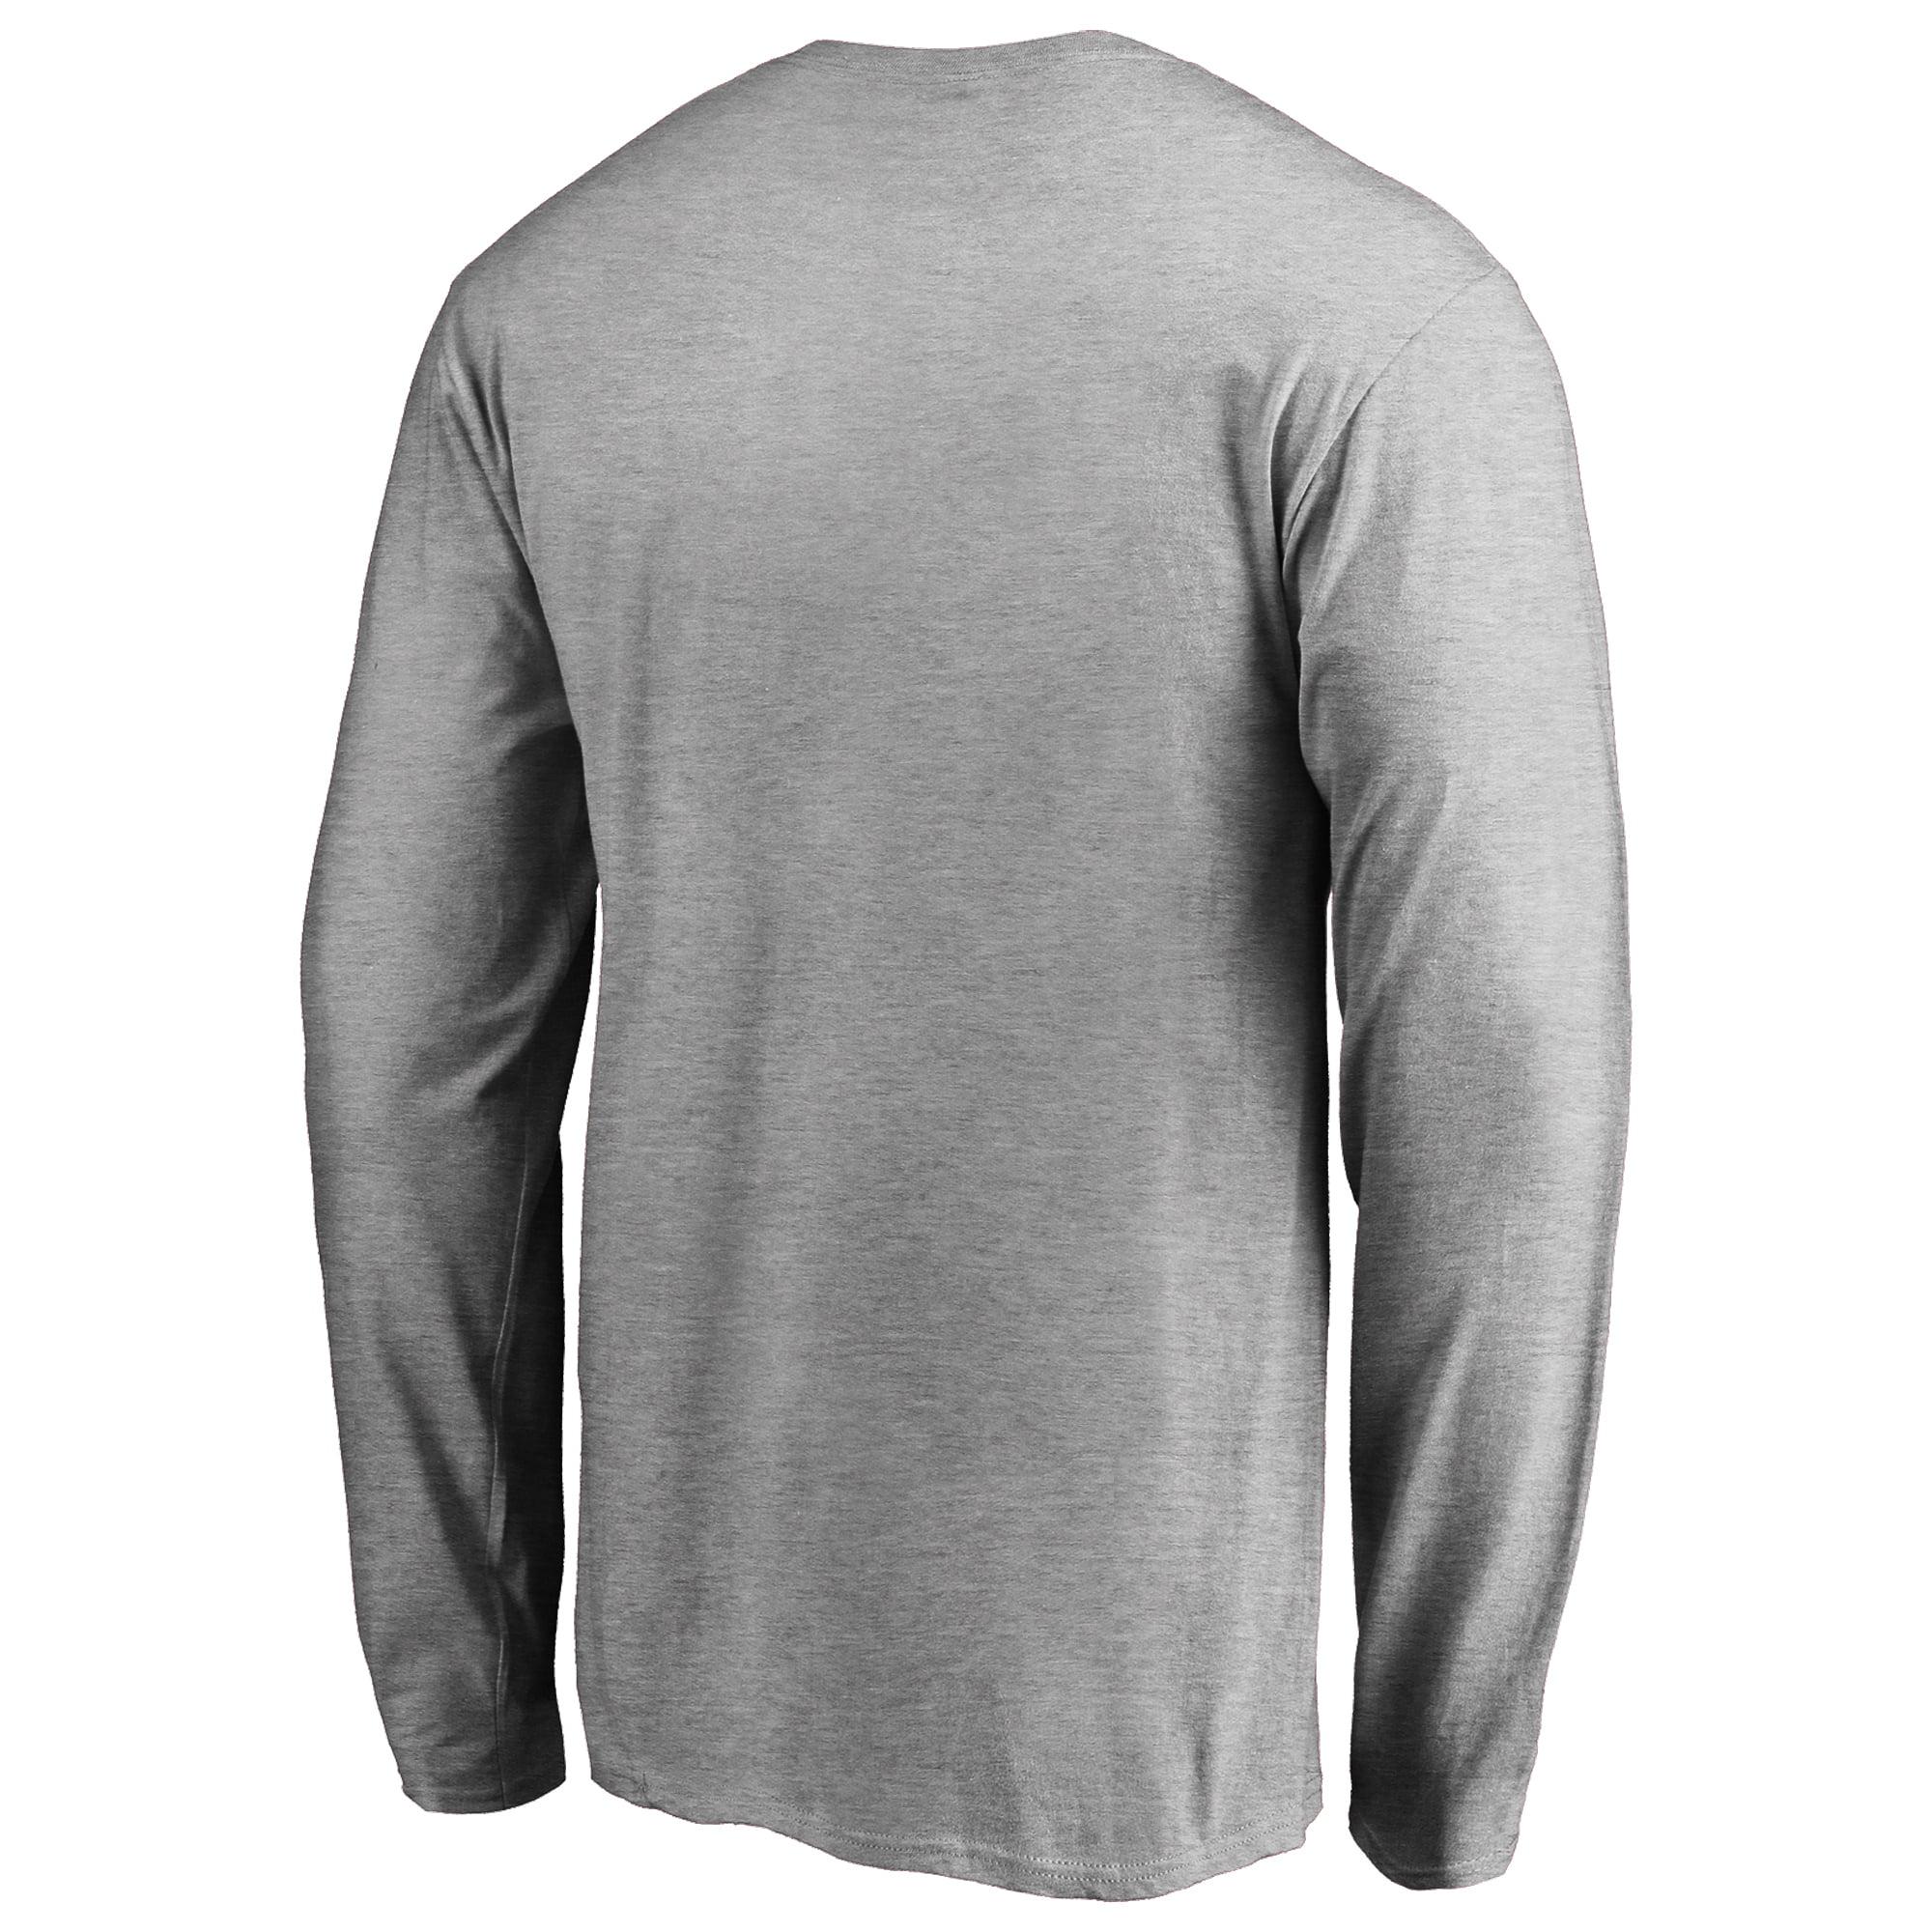 Utah Jazz Fanatics Branded Primary Logo Long Sleeve T-Shirt - Heather Gray  - Walmart.com 3c6b49b13